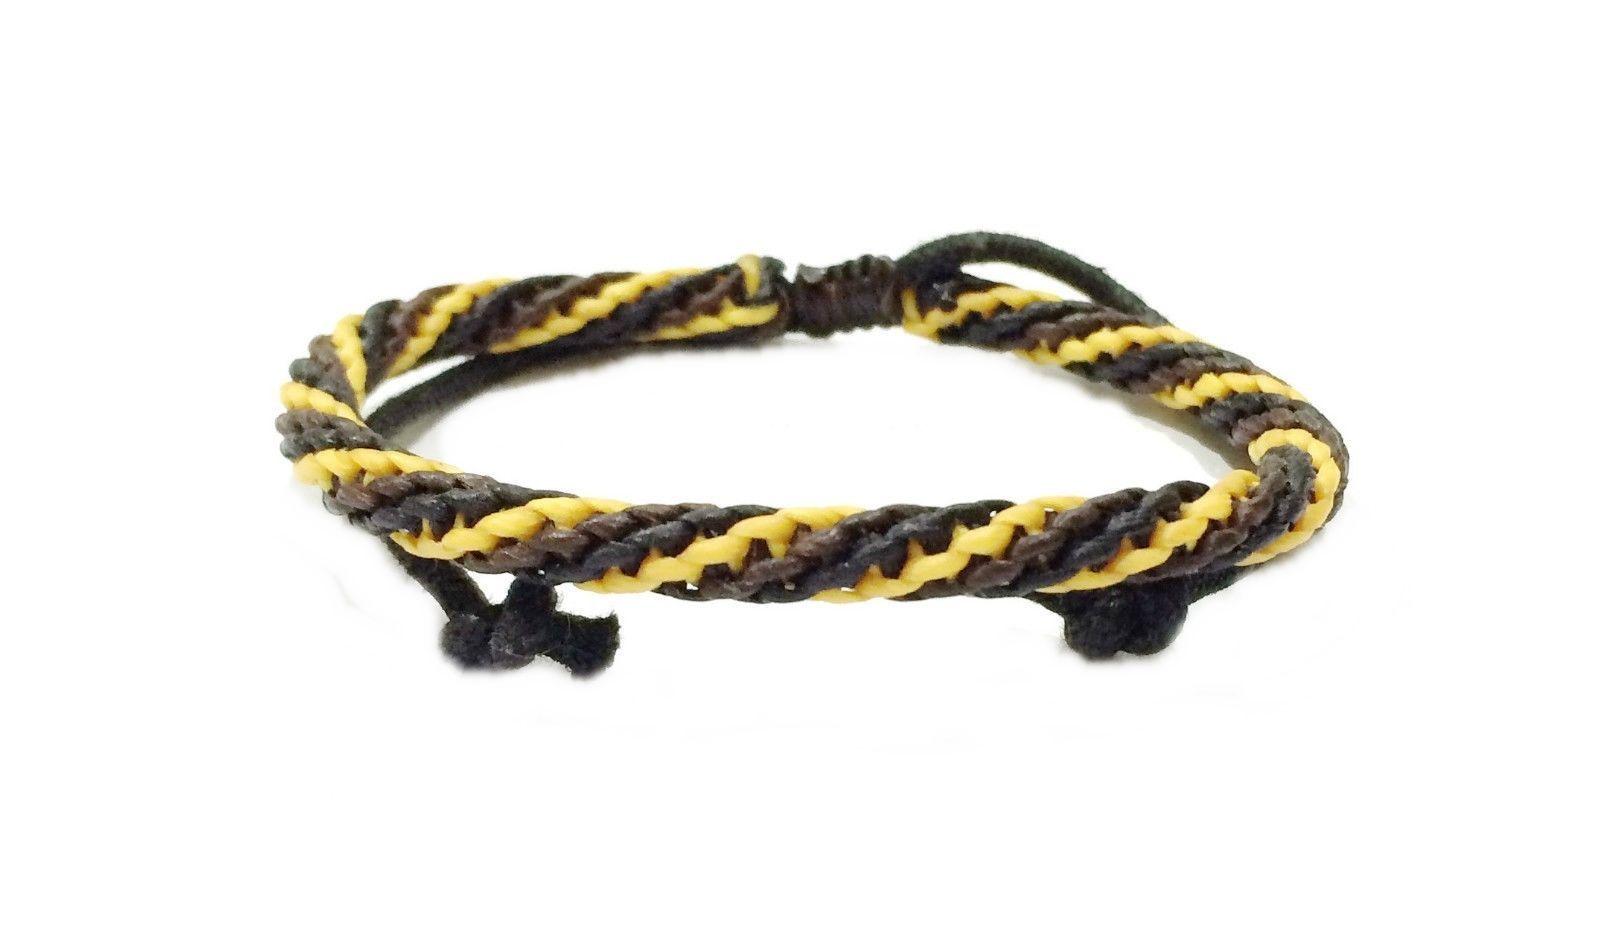 Fair Trade Wax Cord Adjustable Thai Wristband Classic Handcrafted Bracelet